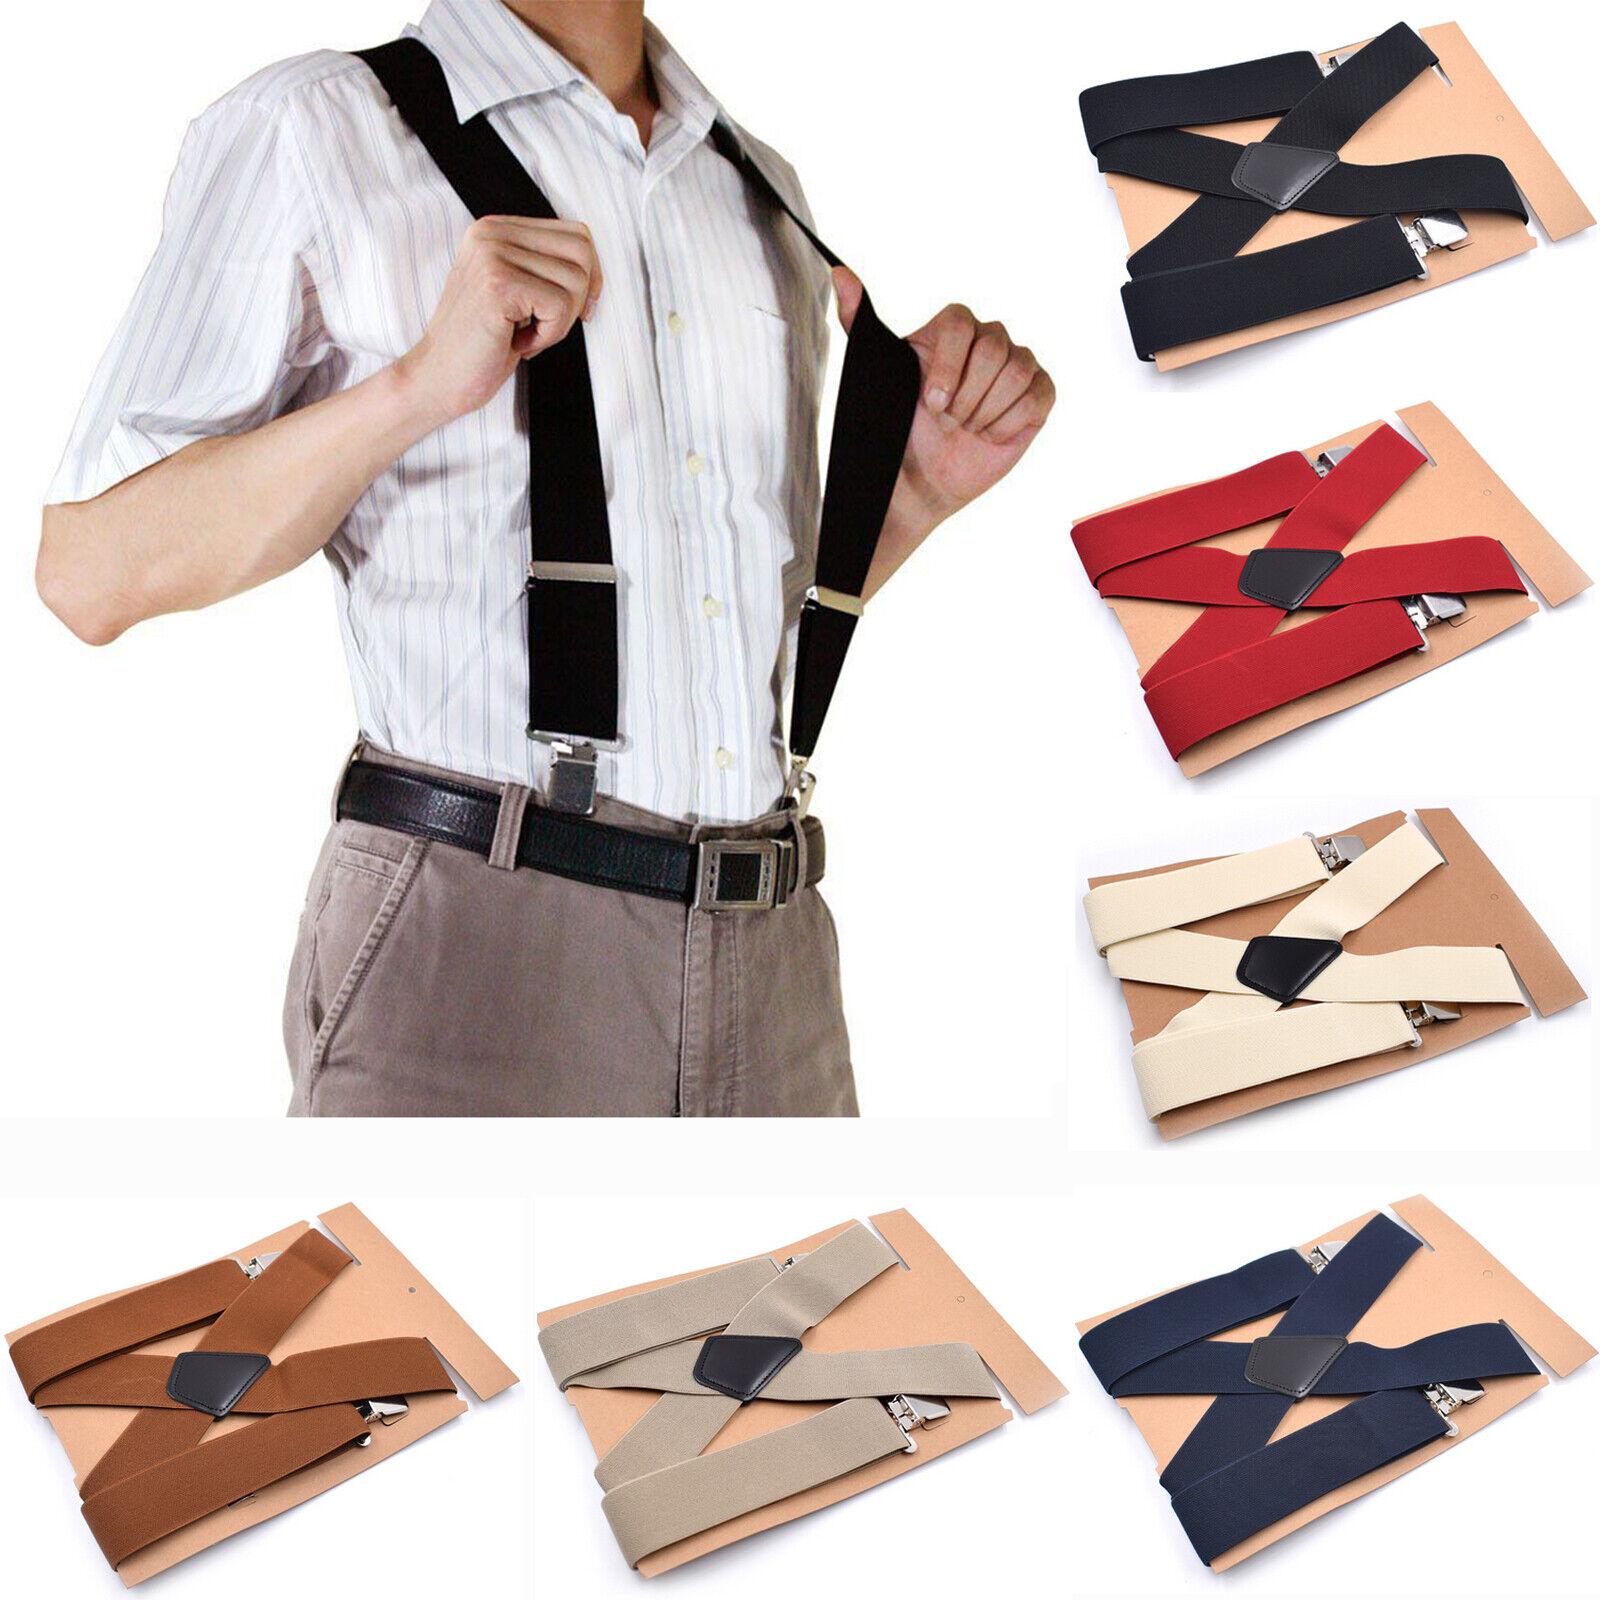 UK Men's Ladies 50mm Wide Braces Plain Heavy Duty Suspender Elastic Adjustable